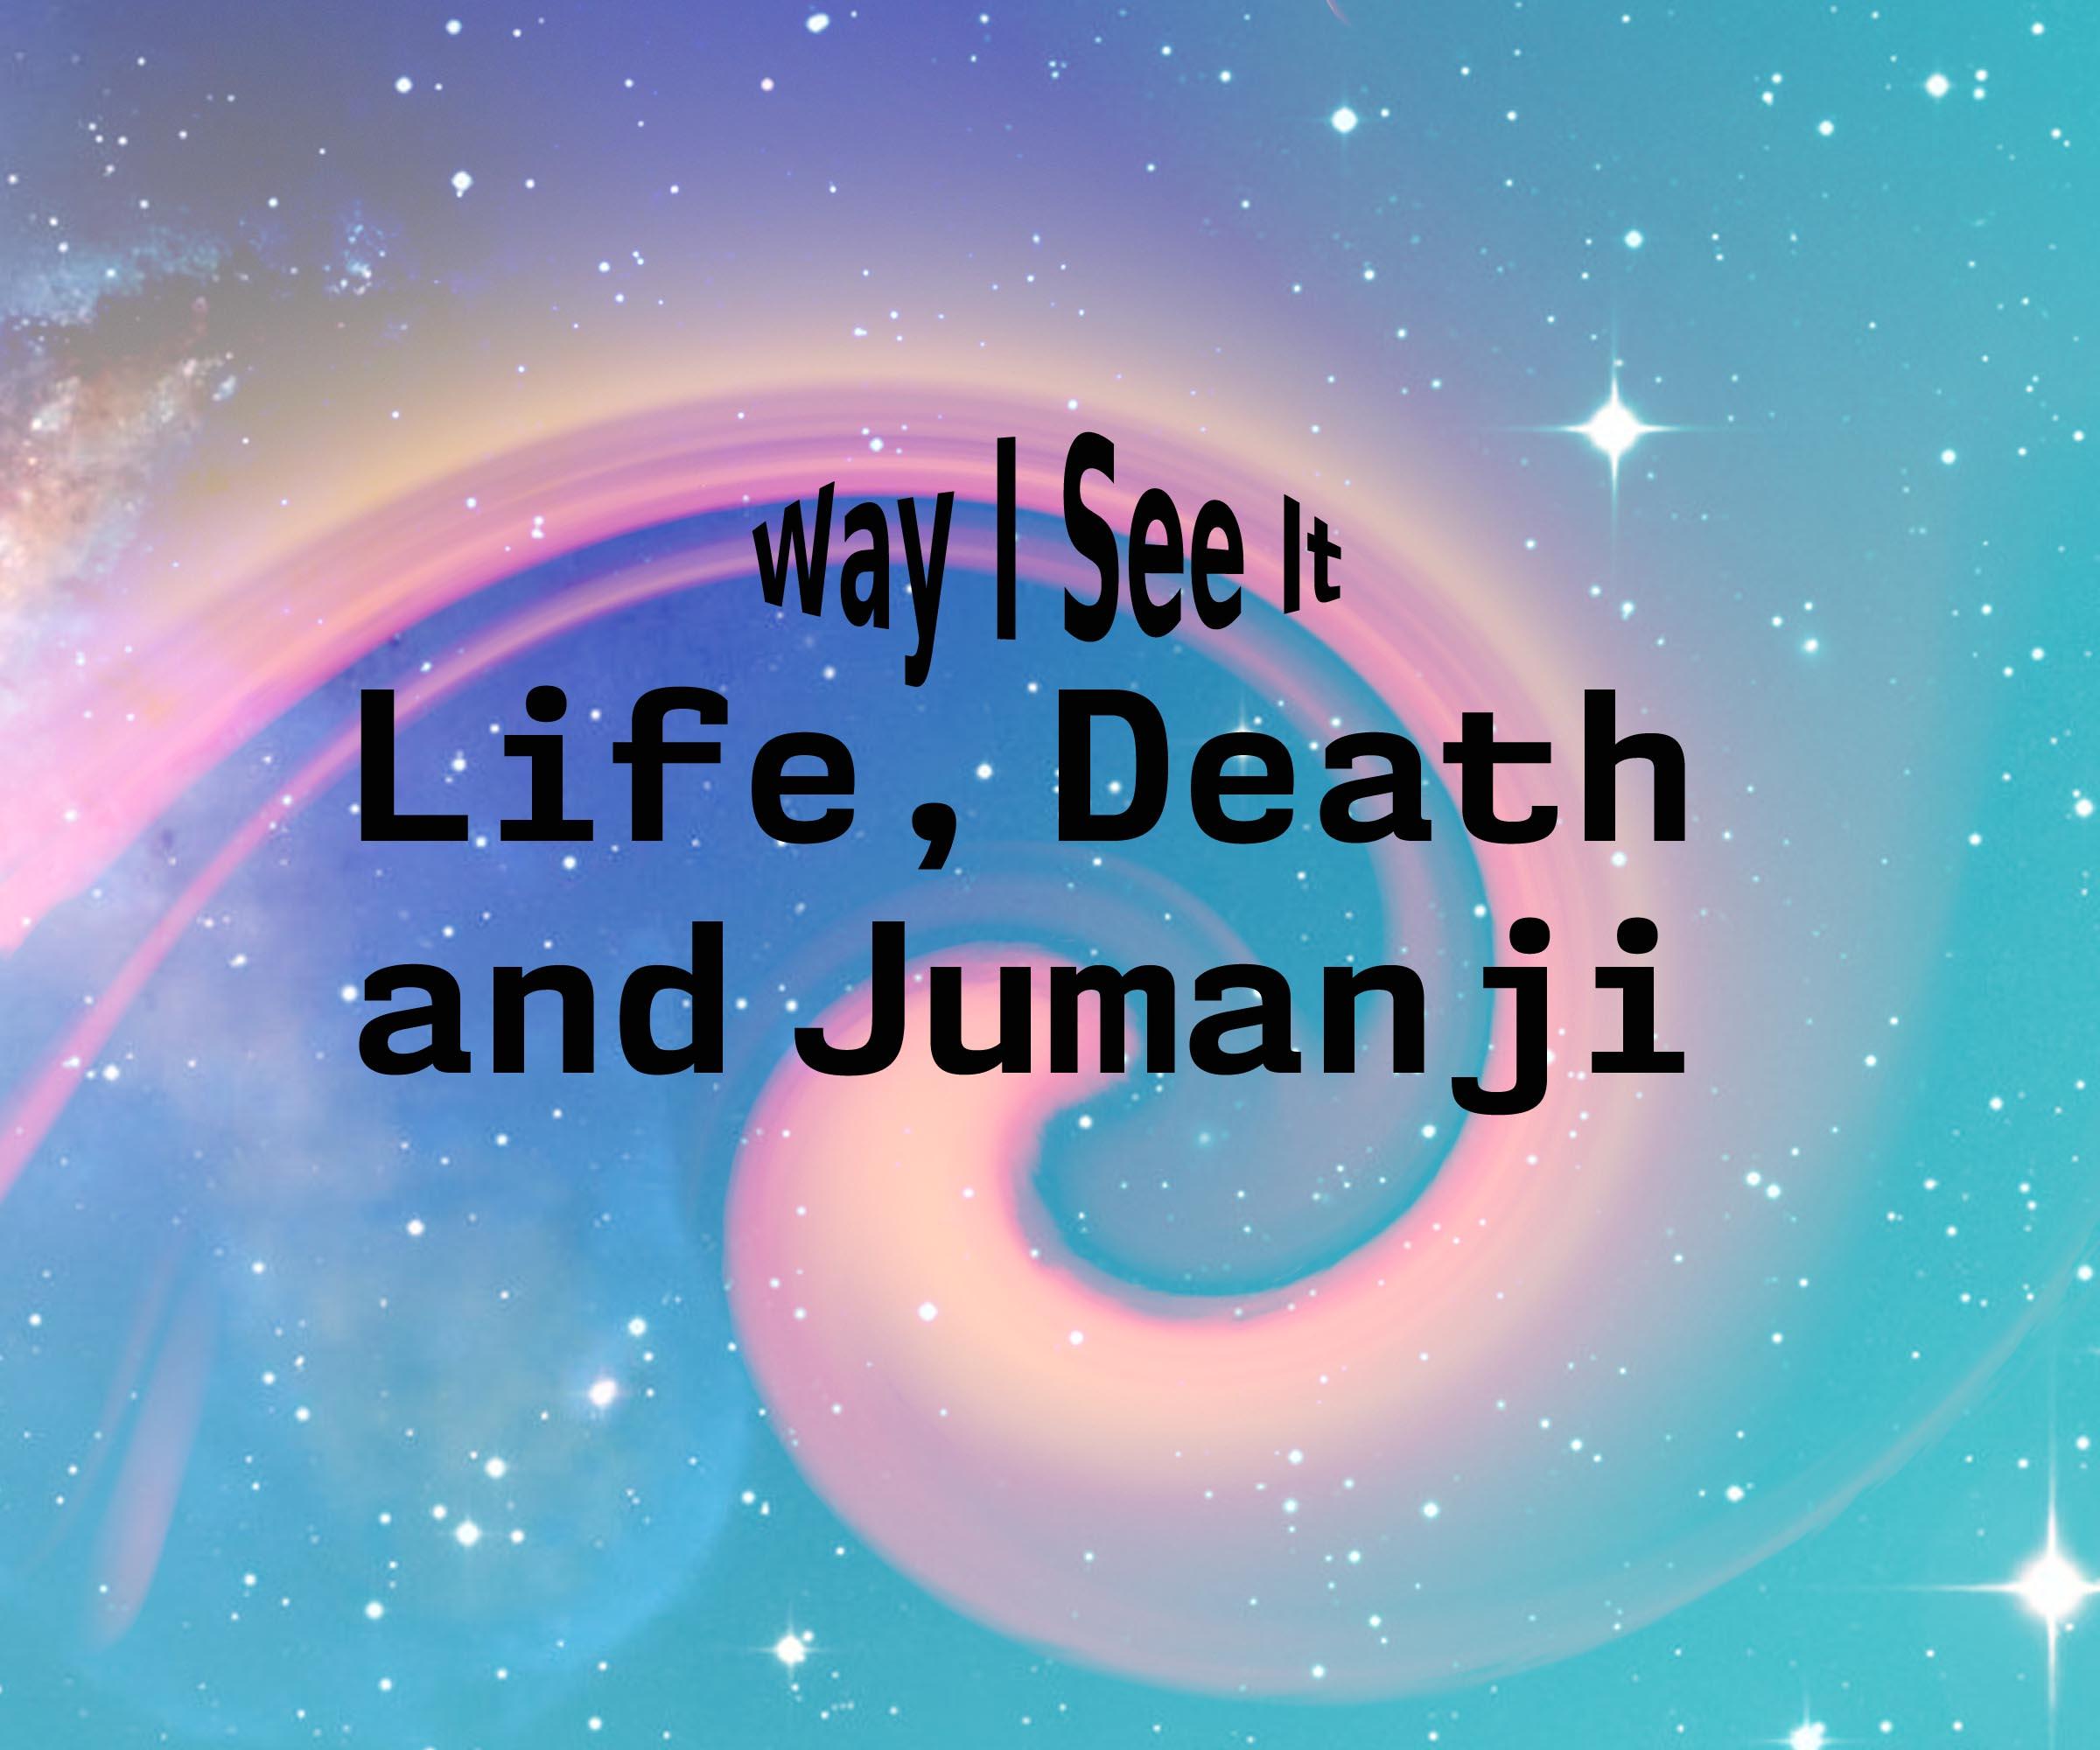 Way I See It: Life, Death and Jumanji